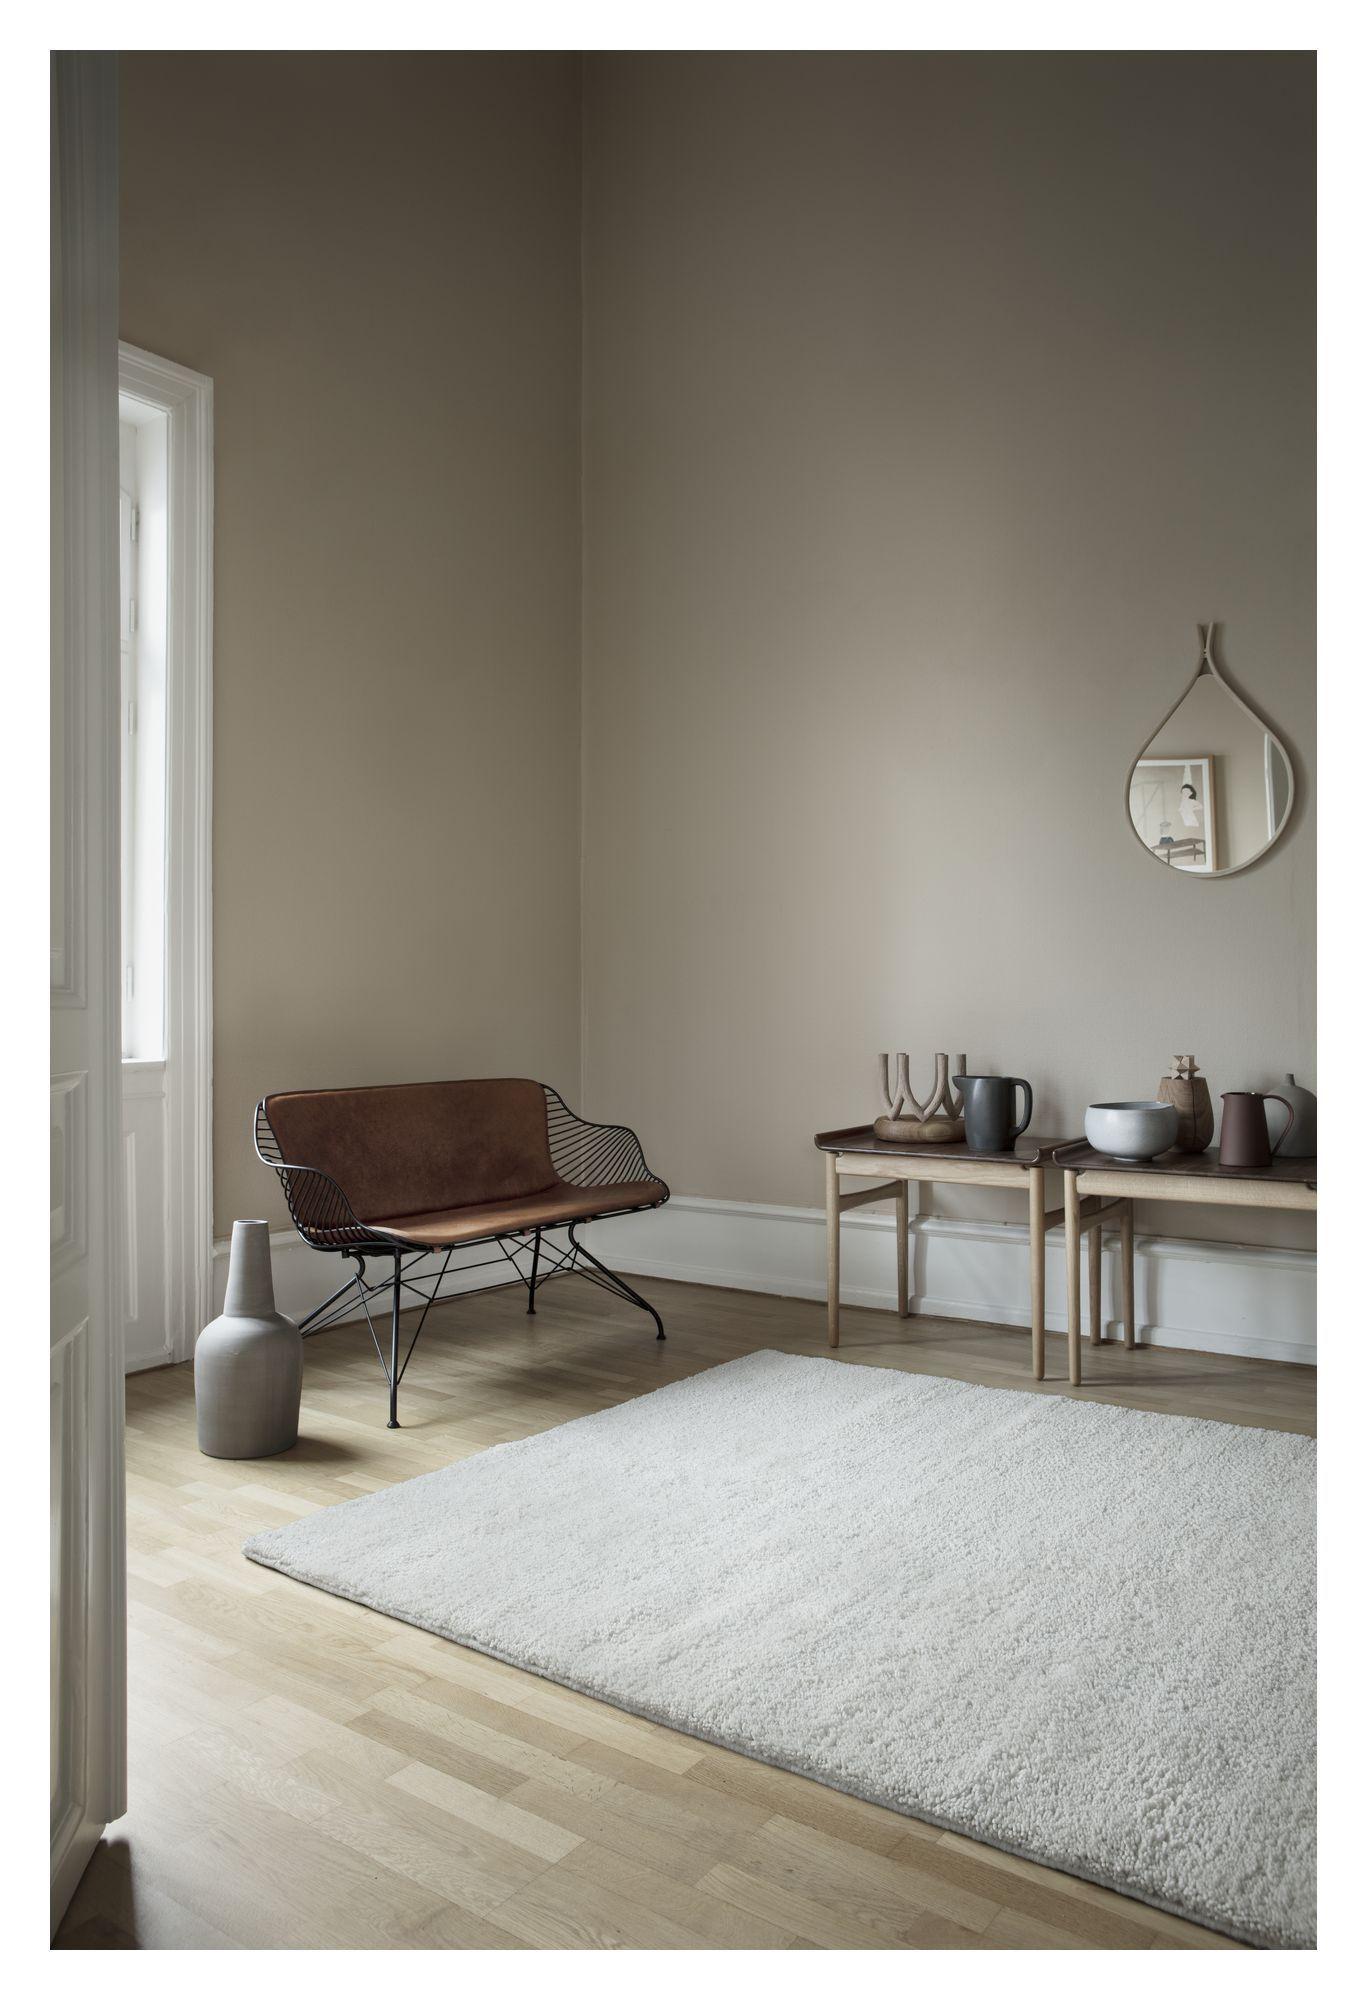 Fabula Living - Thor Hvid Luvtæppe - 200x300 - Luvtæppe 200x300 cm